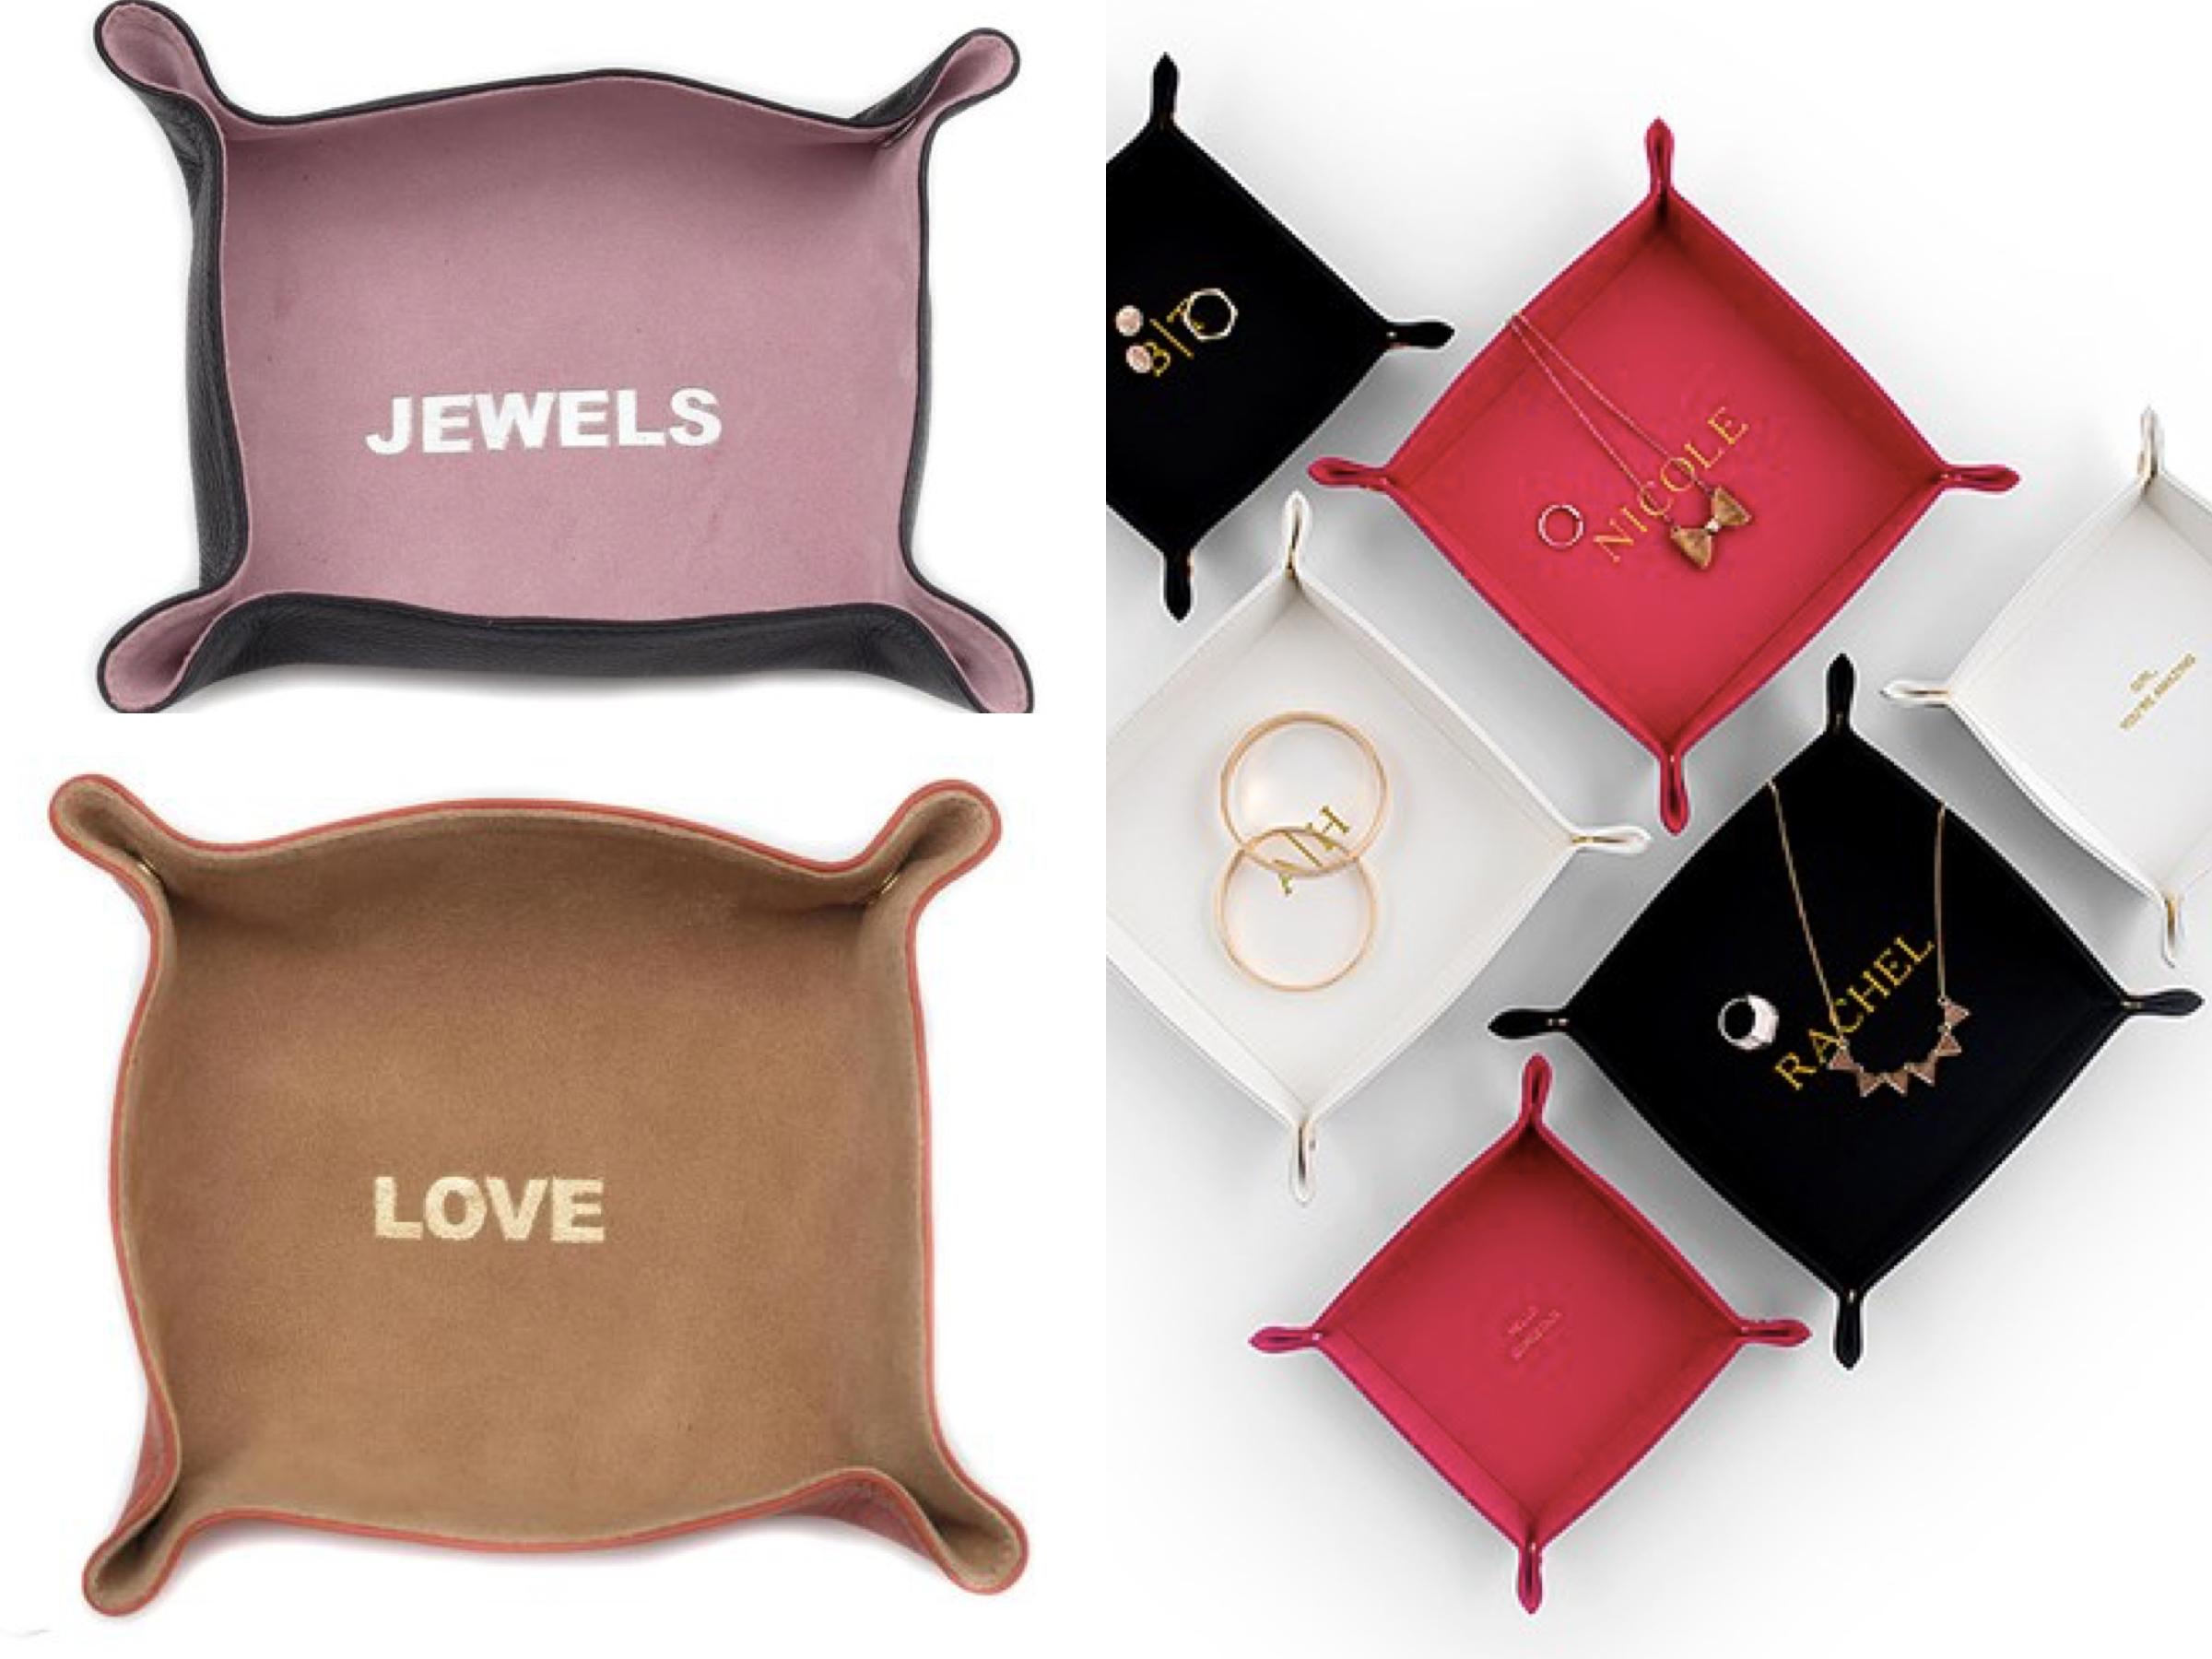 Leather Jewelry Tray